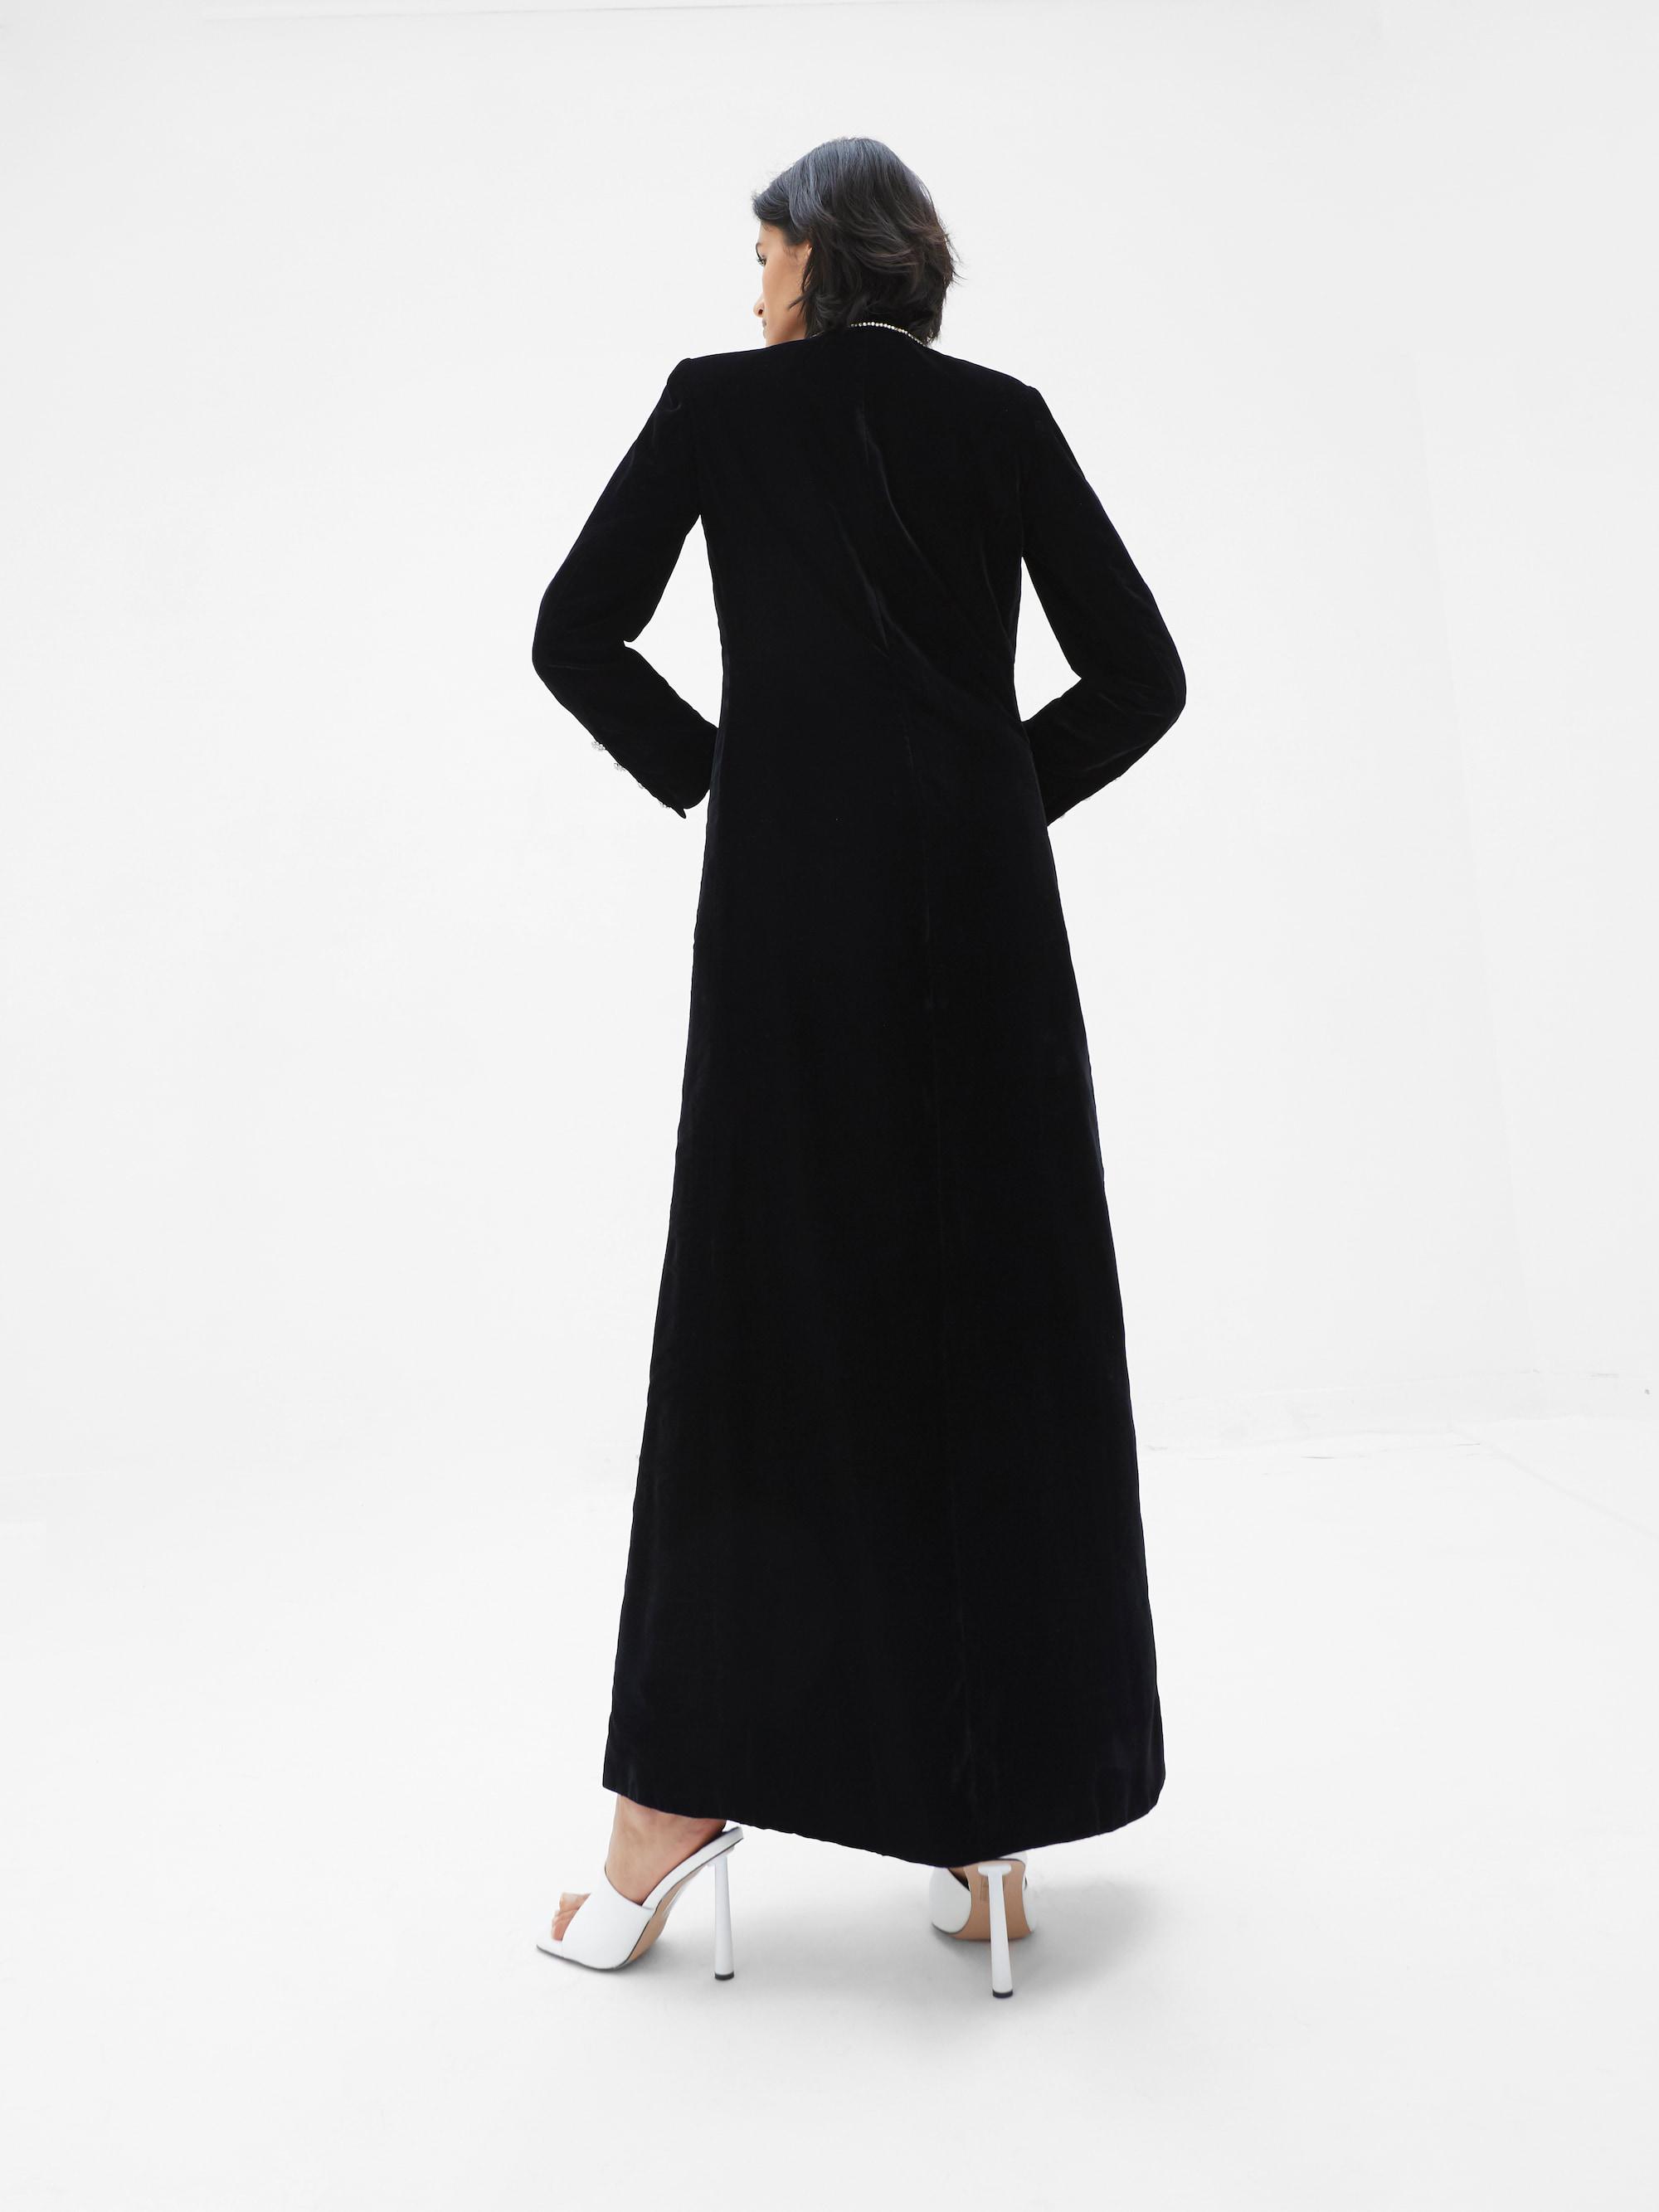 View 2 of model wearing Kalia Kimono in black.